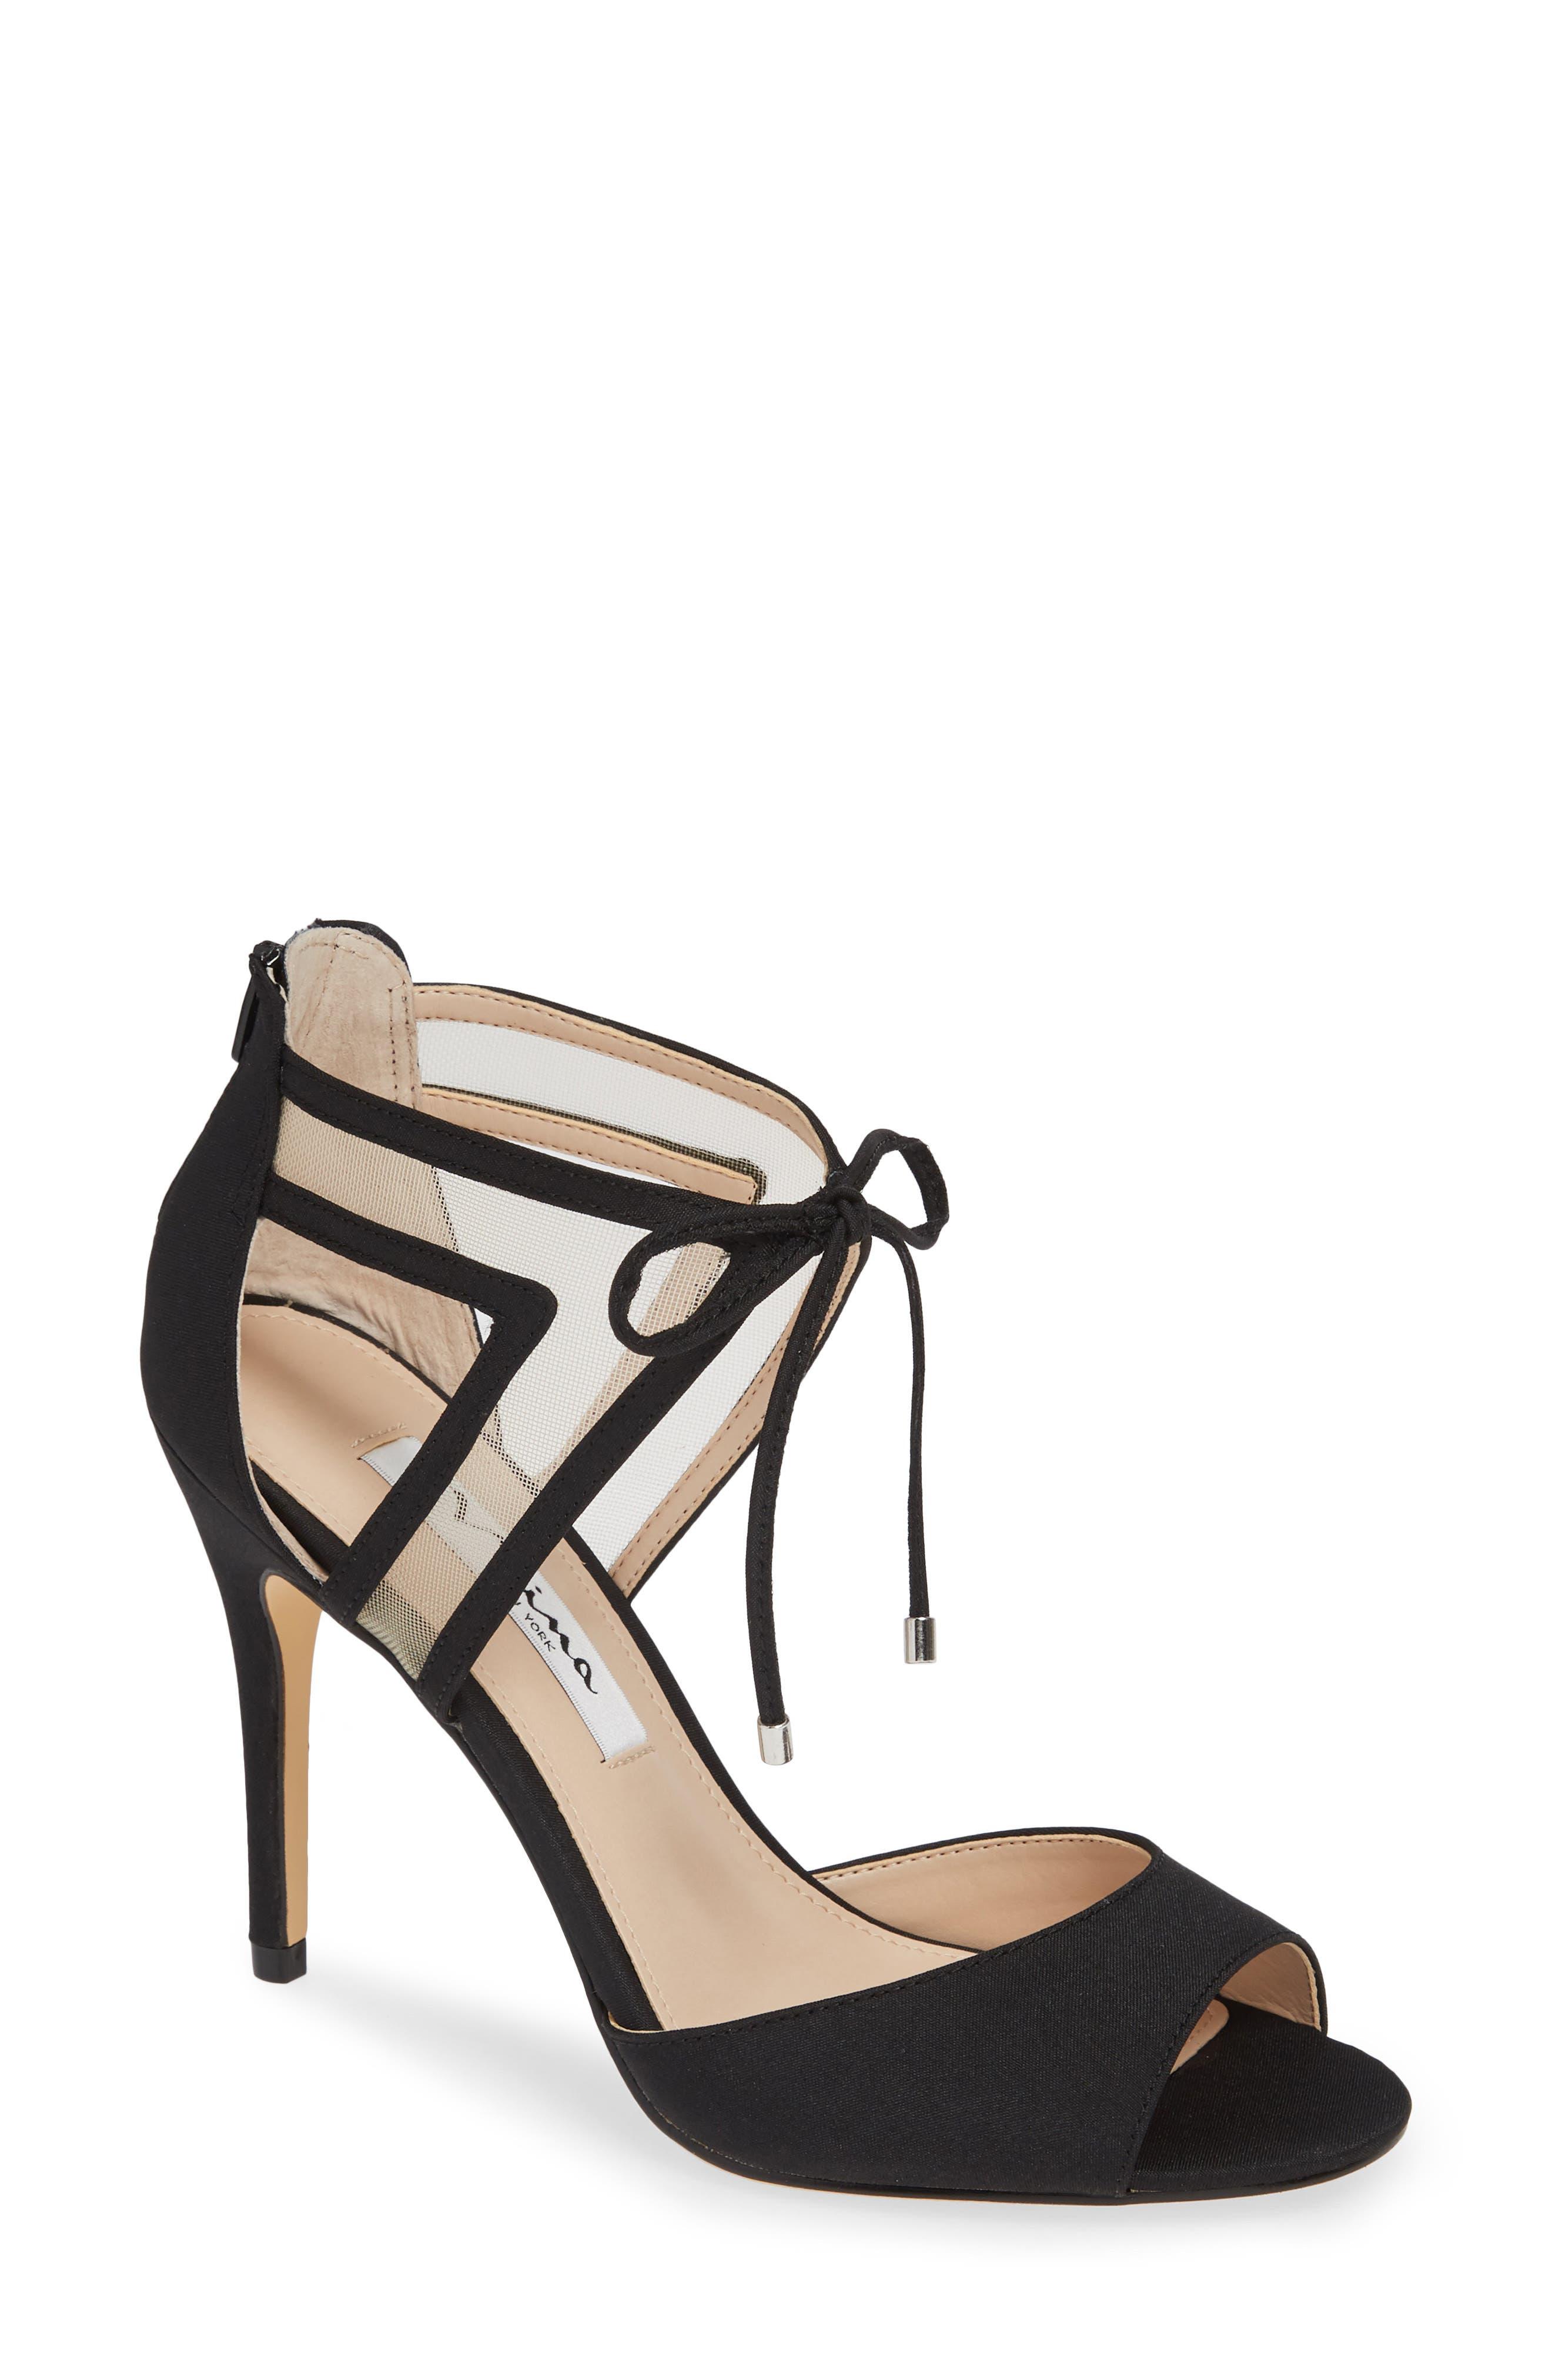 Caleya Ankle Tie Sandal,                             Main thumbnail 1, color,                             BLACK CHAMPAGNE